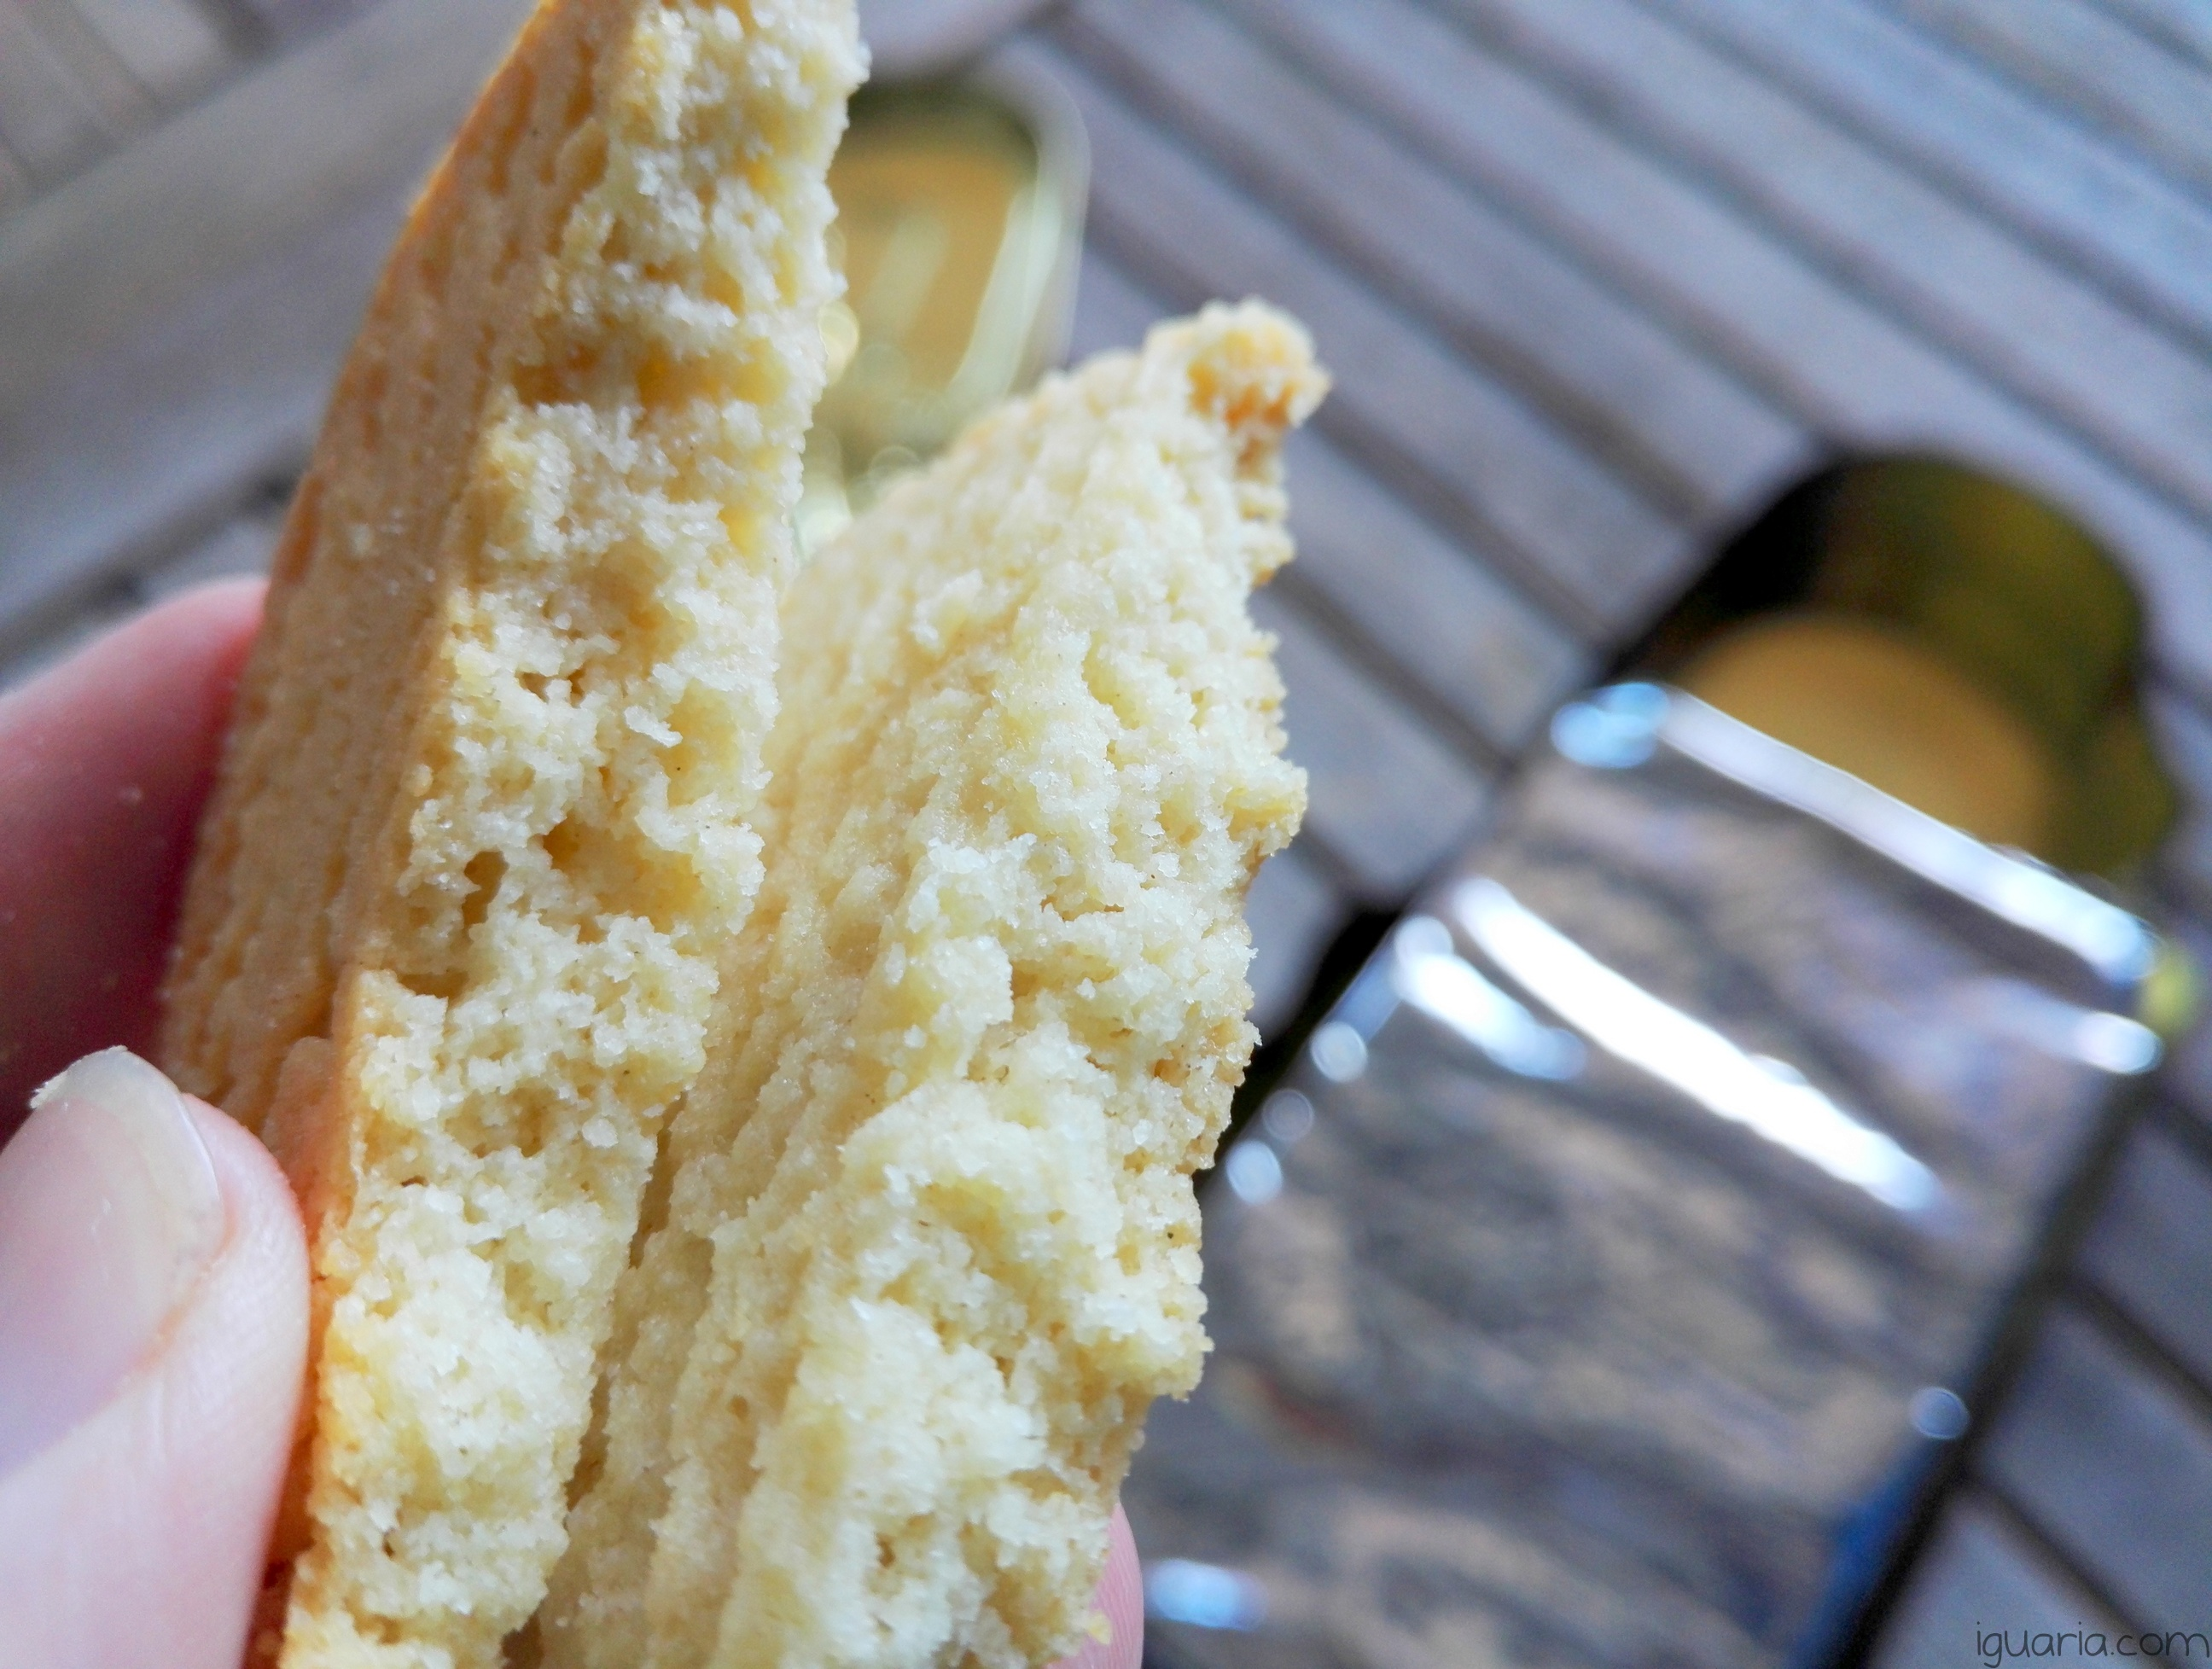 iguaria-interior-bolacha-de-manteiga